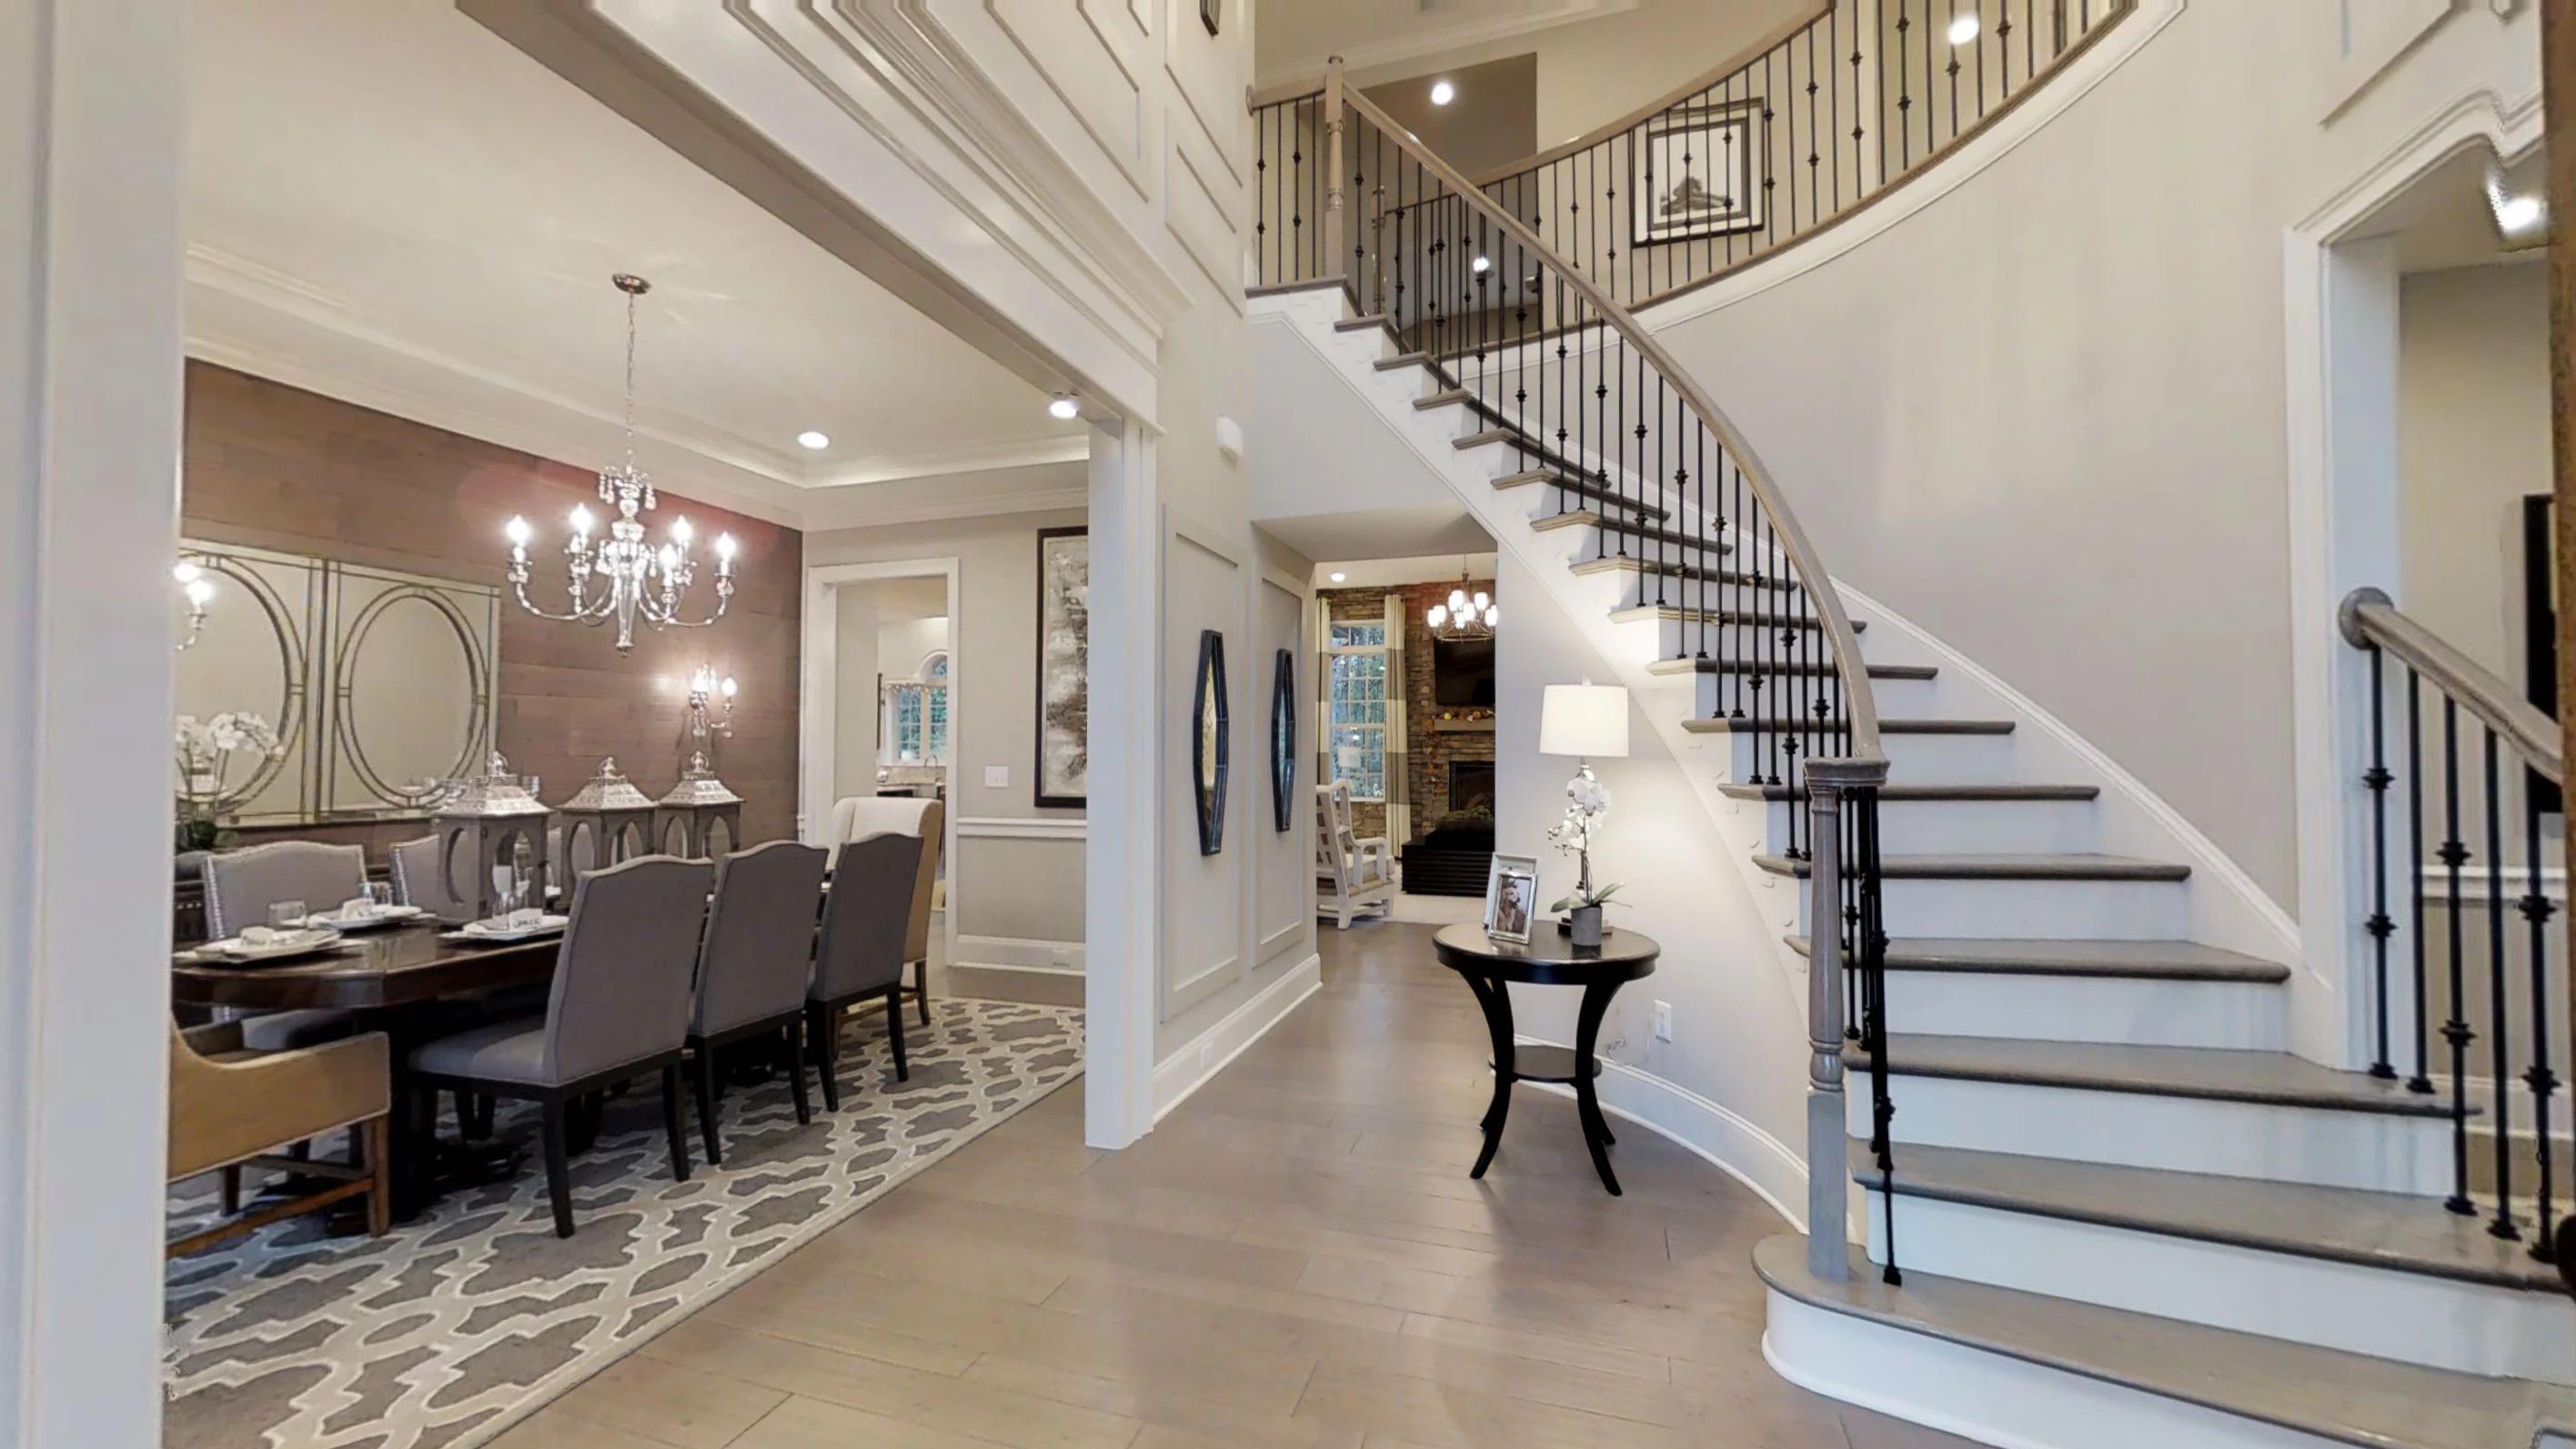 Sweet home 3d an interior design application to draw house plans & arrange furniture. Matterport 3d Showcase Luxury Homes Home 3d House Plans